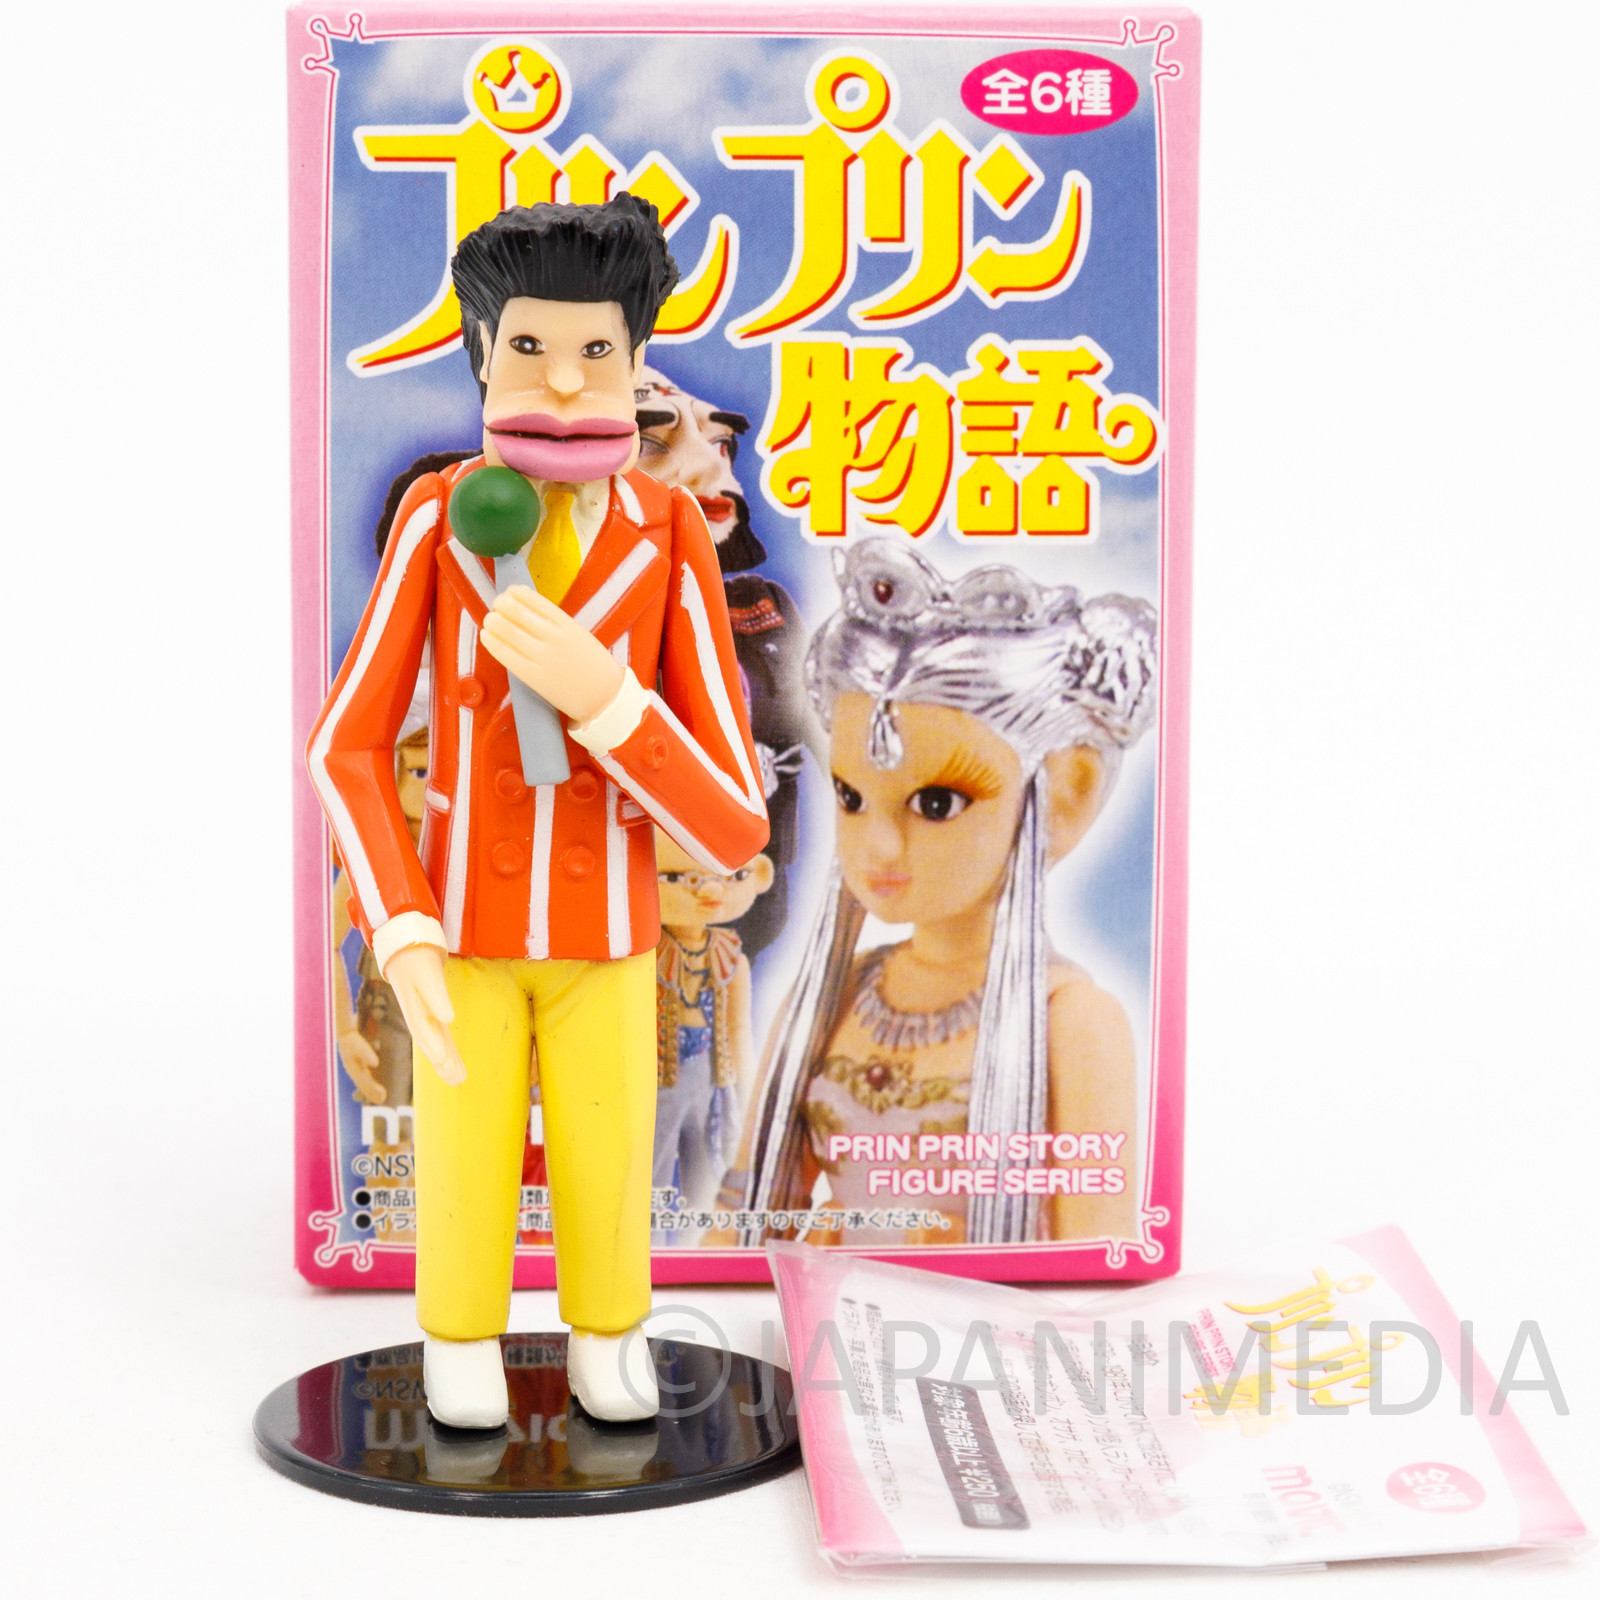 Purin Purin Monogatari Hana no Announcer Figure Puppet Show NHK TV JAPAN ANIME